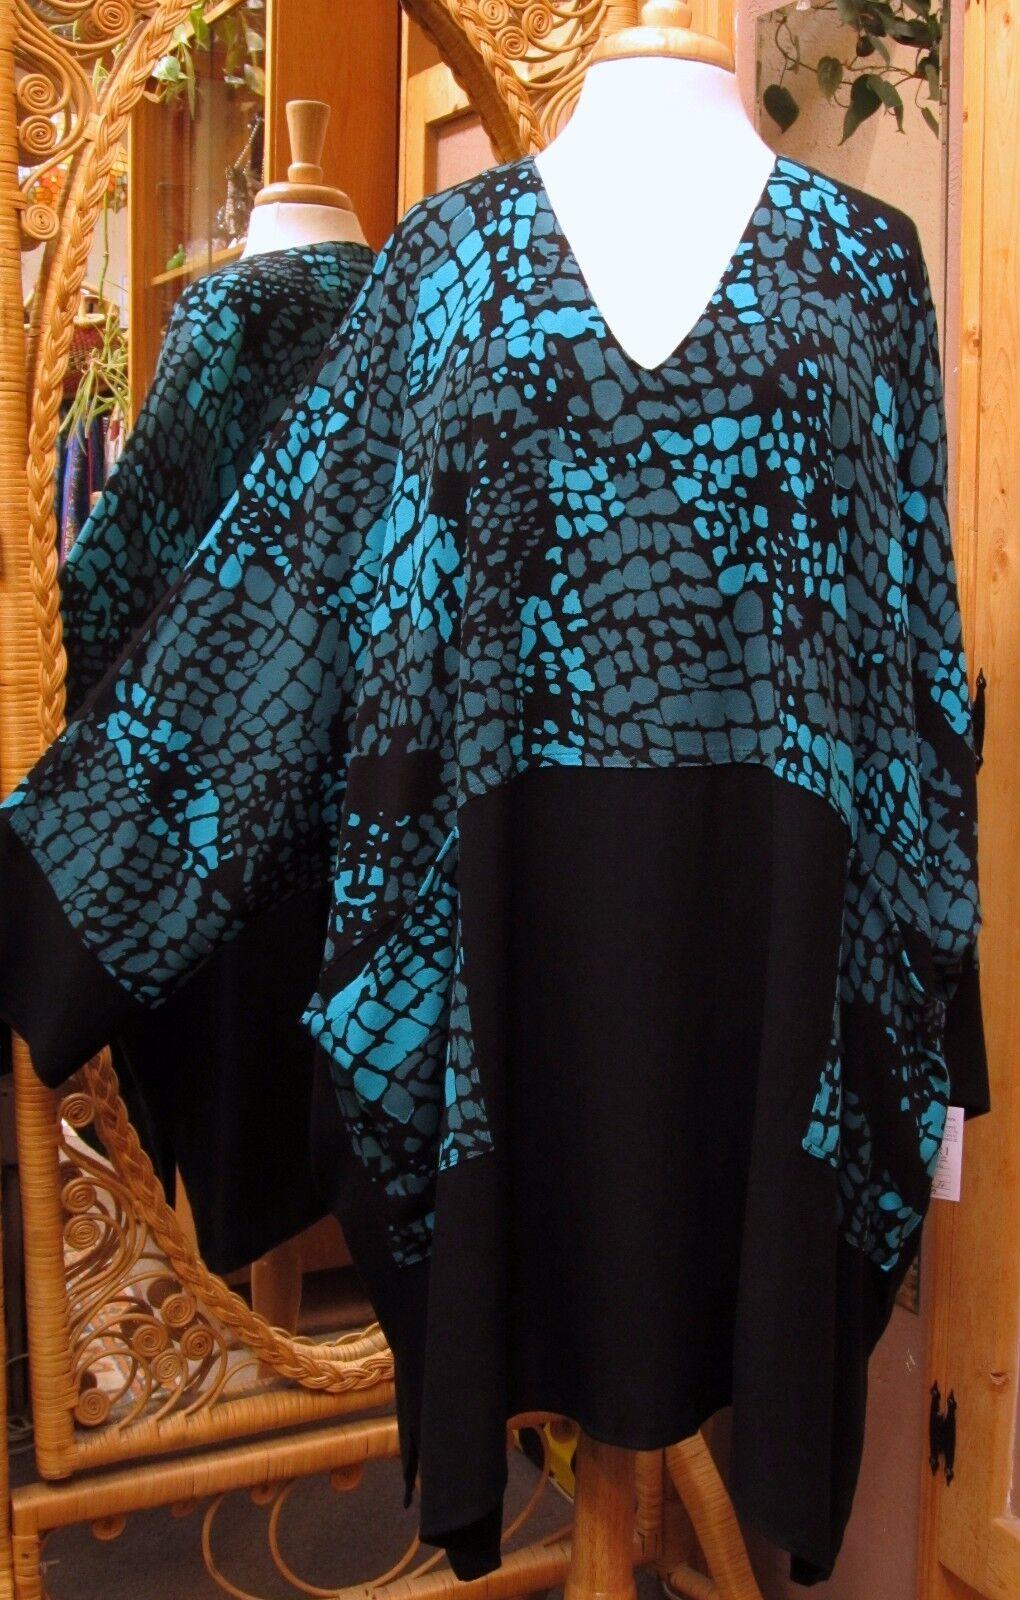 Dairi MGoldccan V & Cowl Neck Long Tunic Dalmatian Print Top 2 Pocket Style 2126